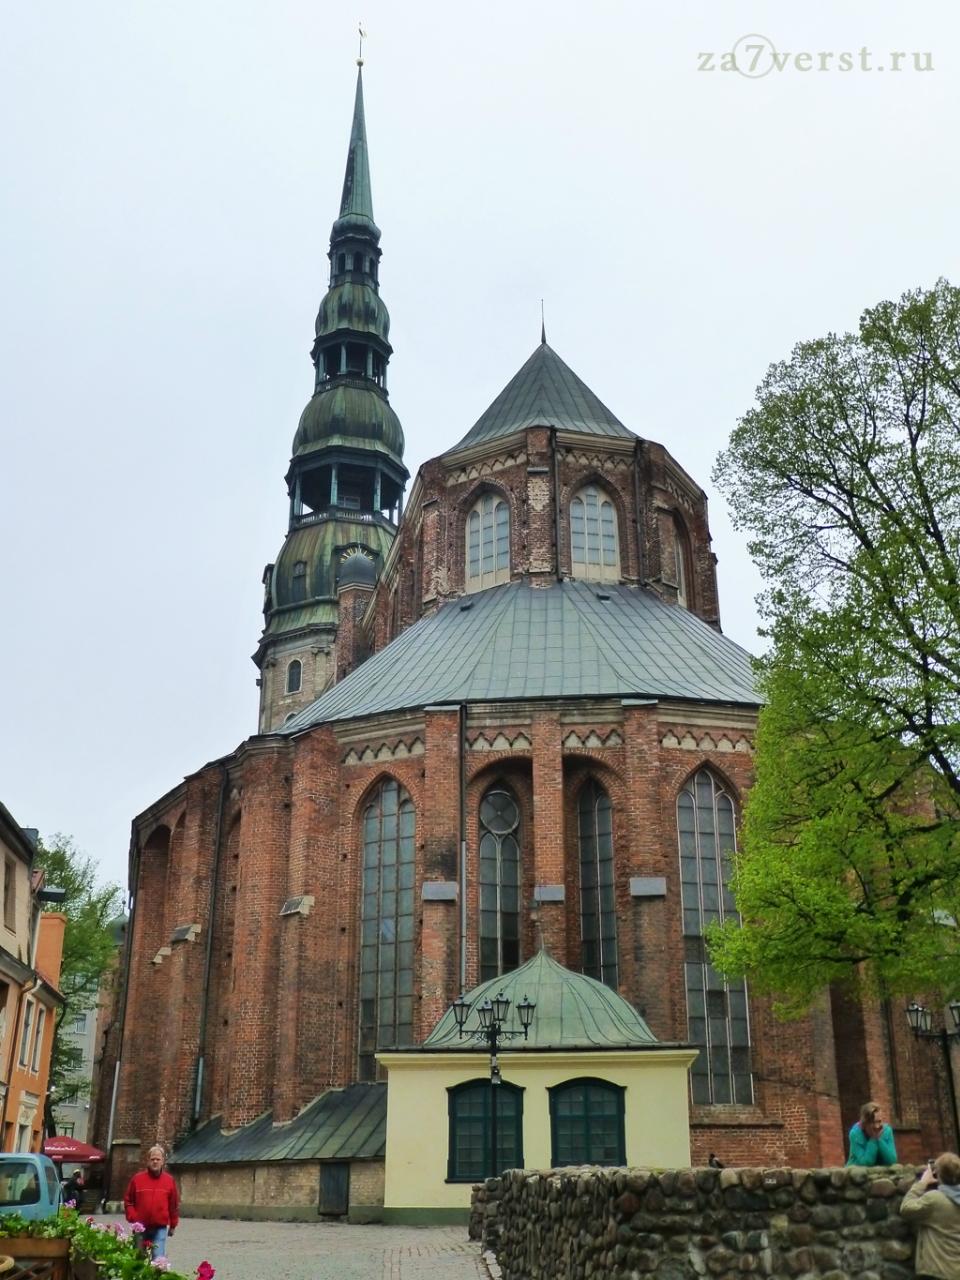 Рига, Латвия